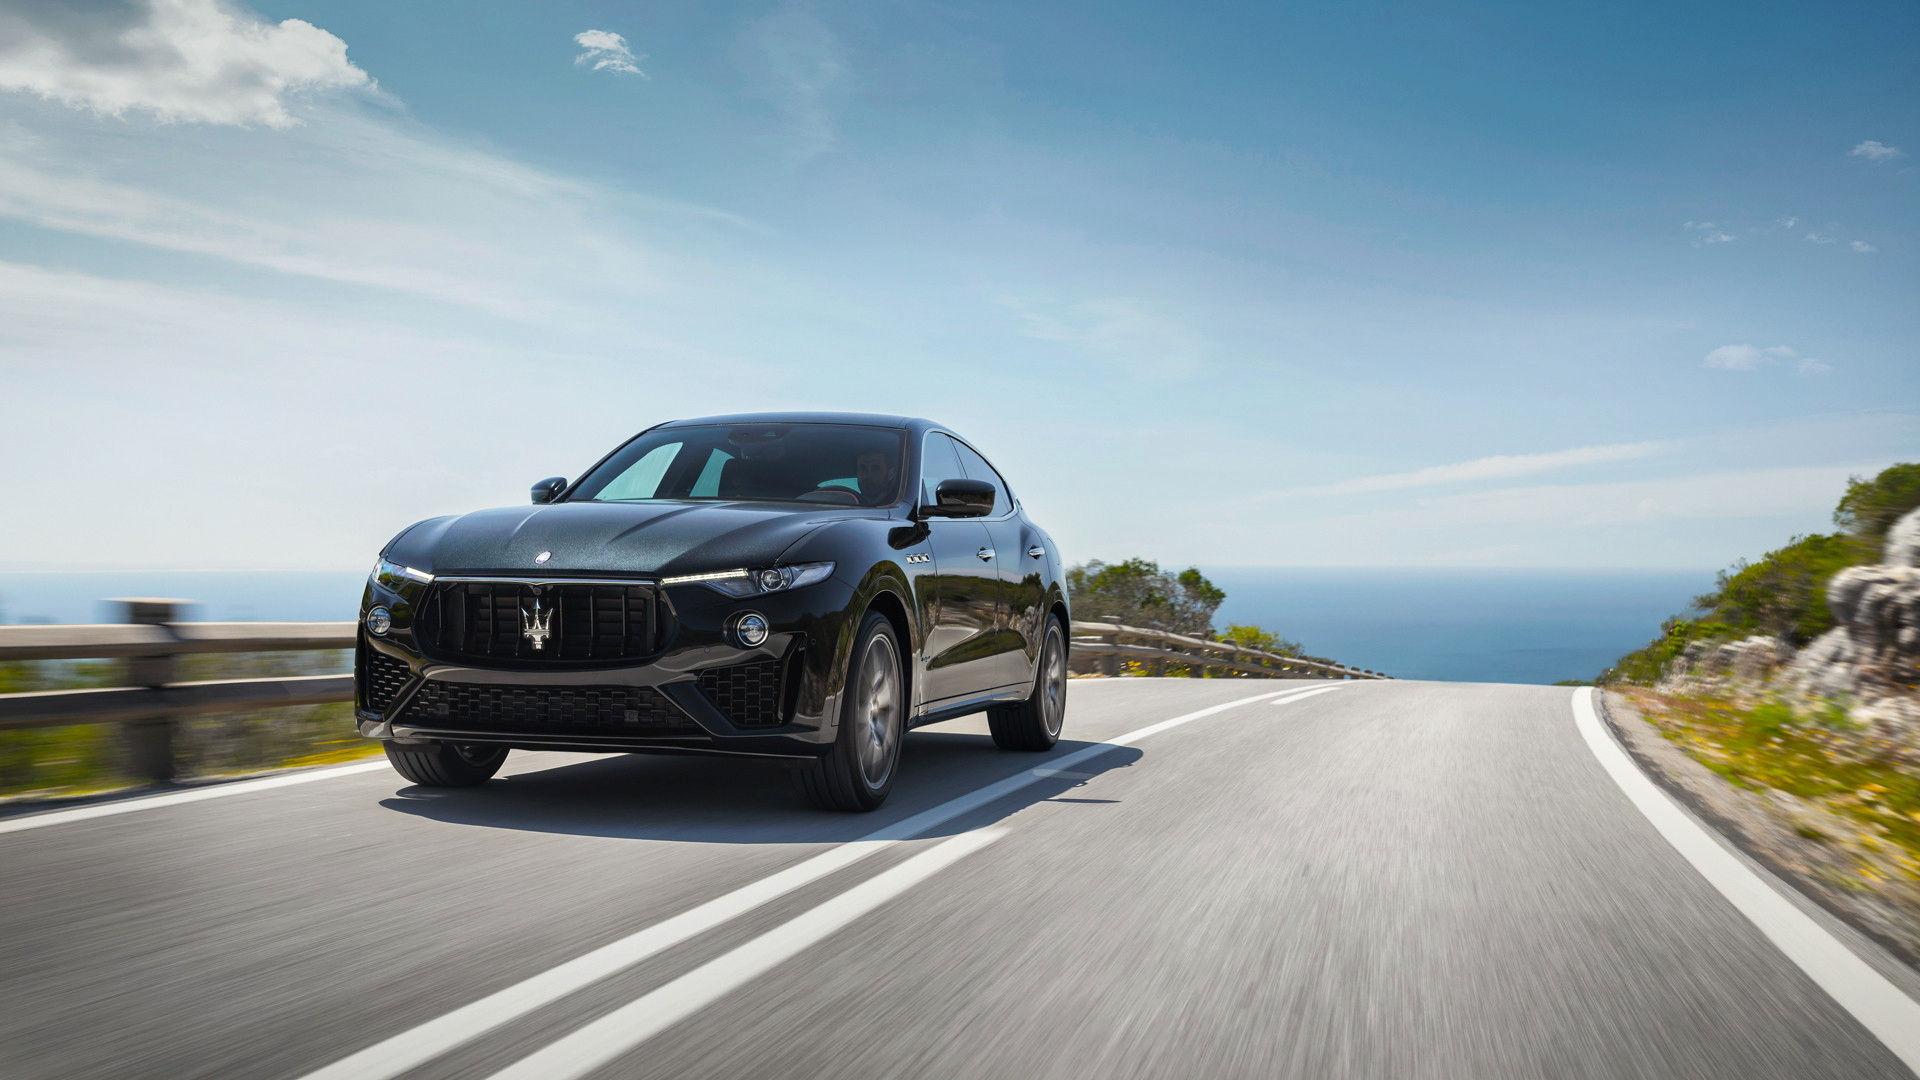 Maserati Levante on the road - seaside background